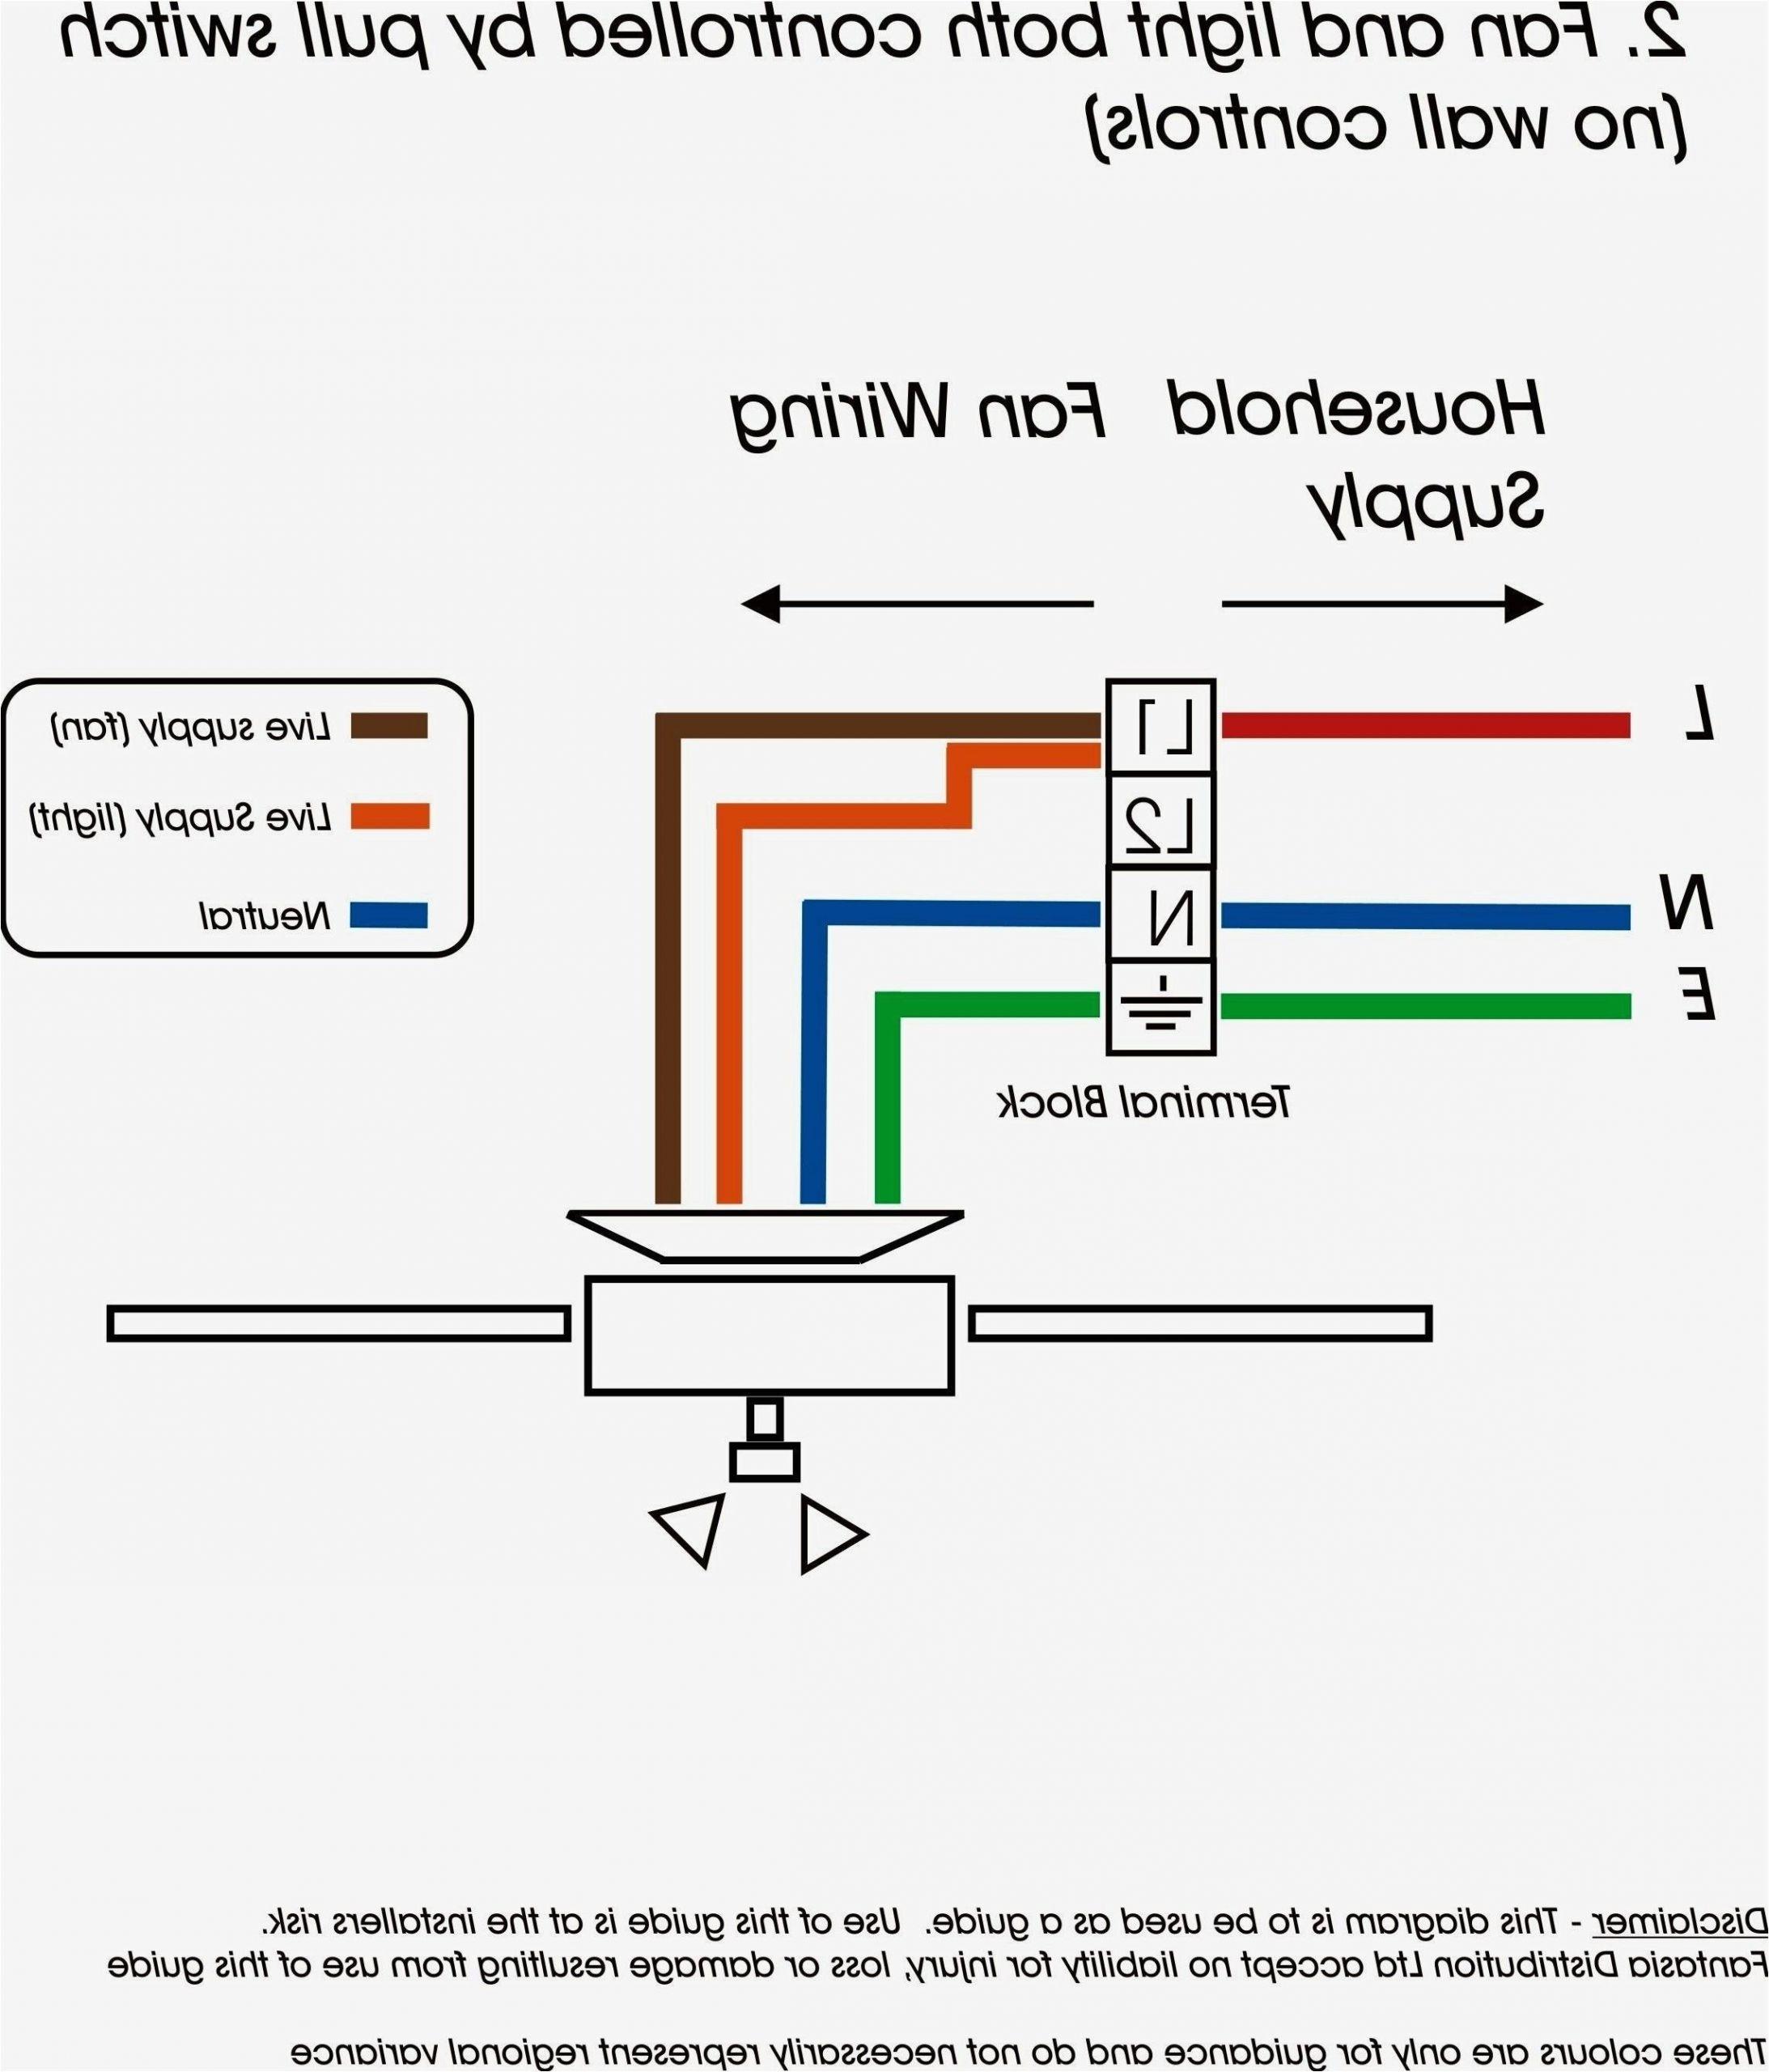 Honeywell Transfer Switch Wiring Diagram New Wiring Diagram for A Double Light Switch Diagram